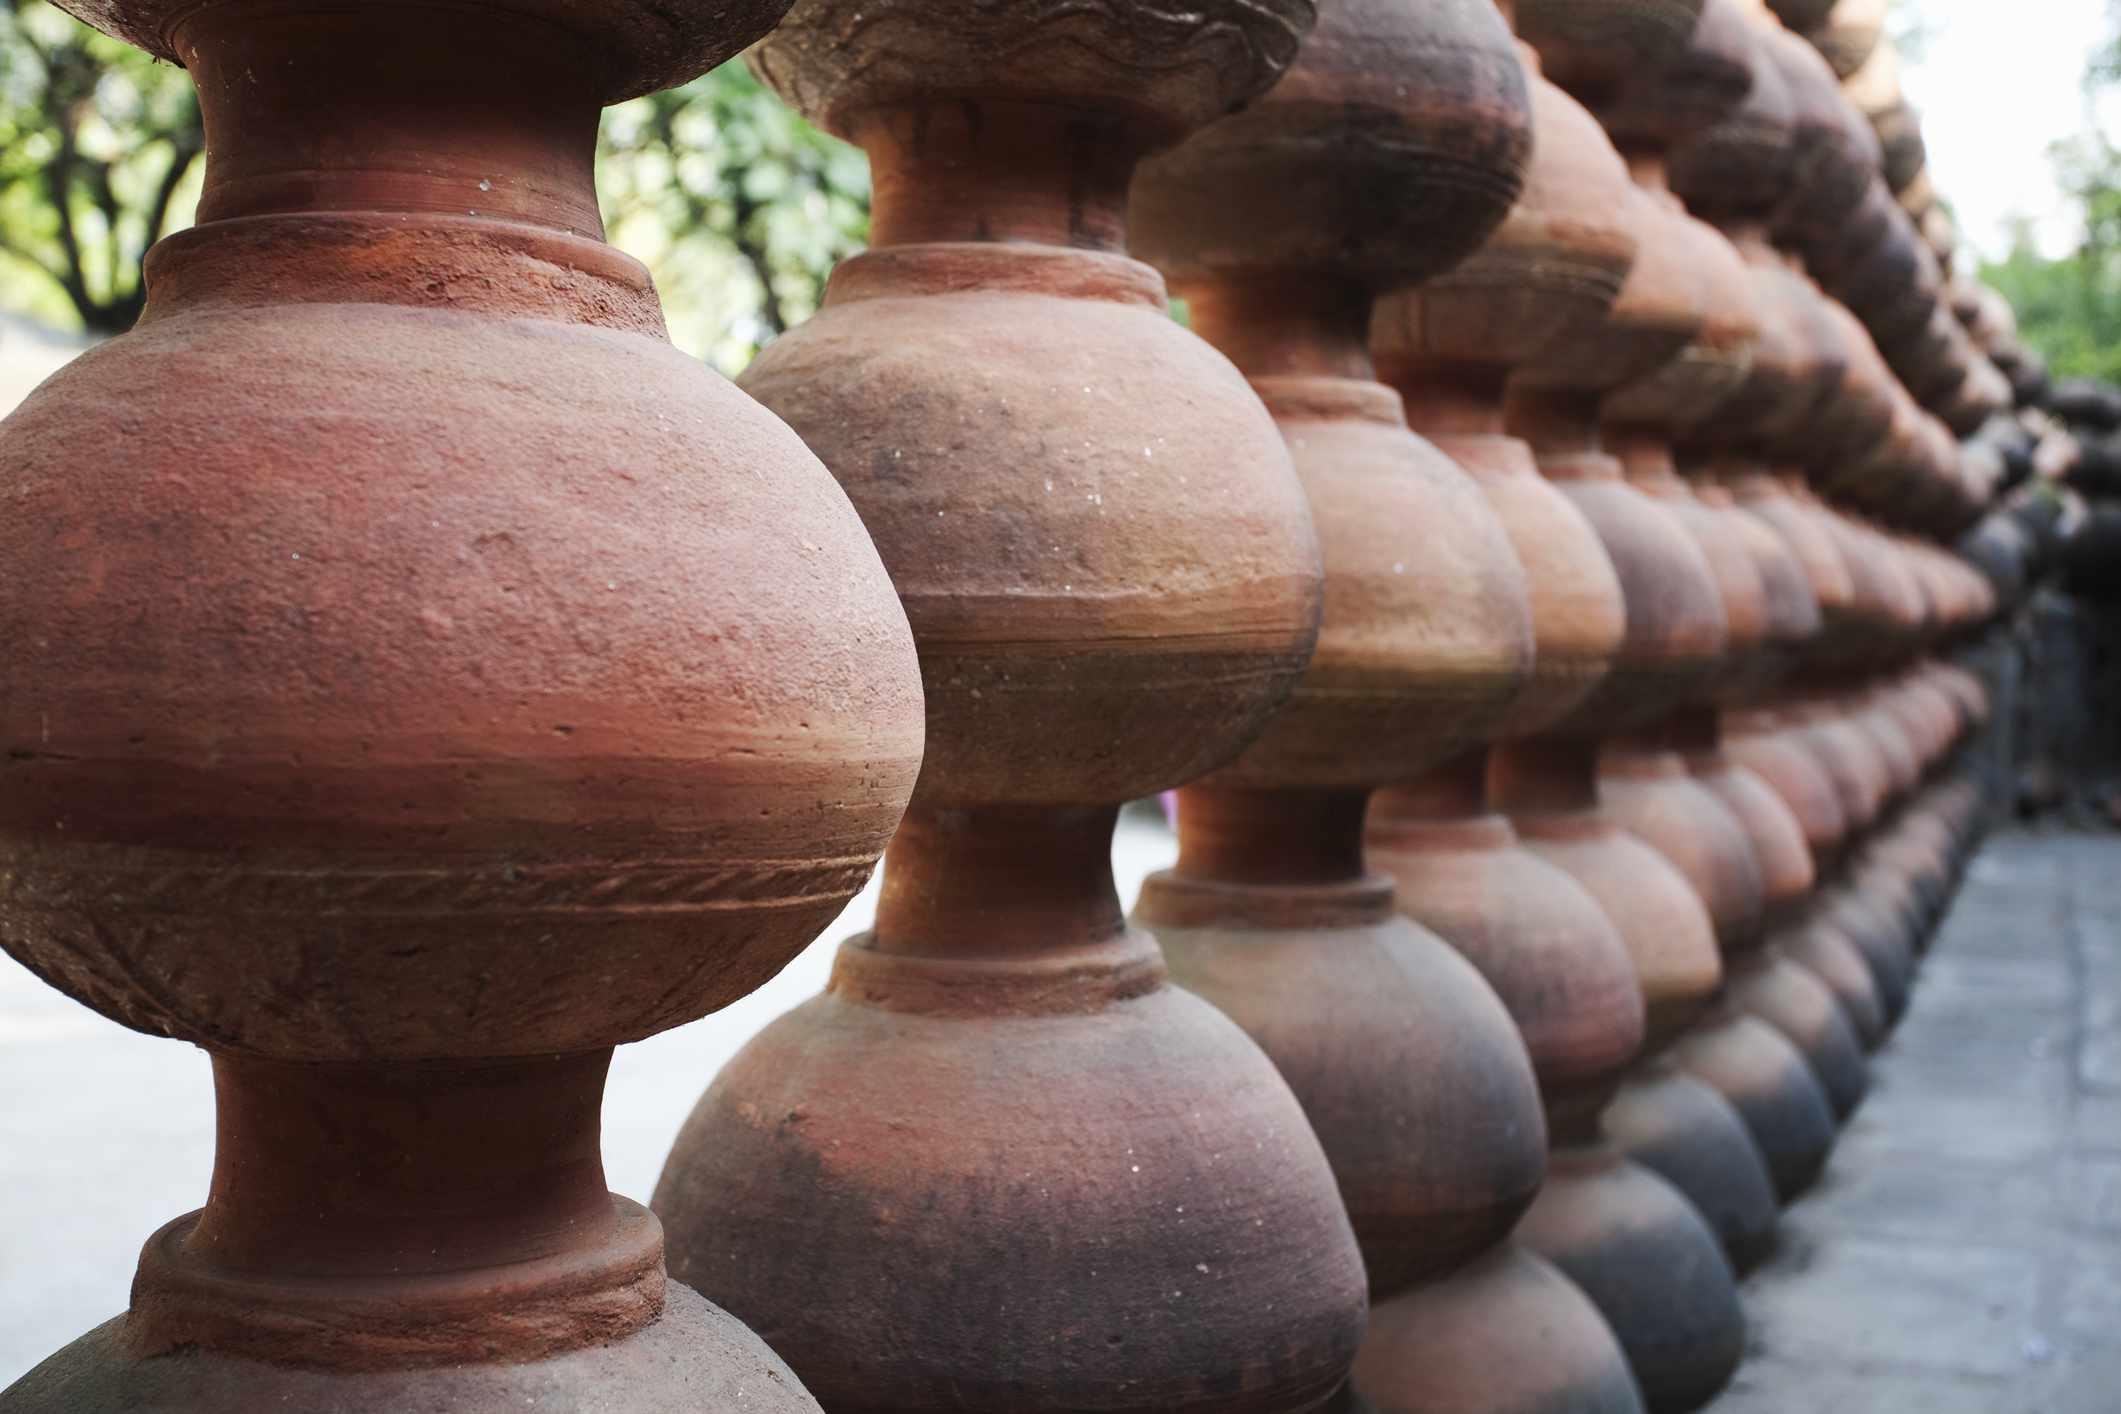 Clay pots lining yard in village of Thikarda.